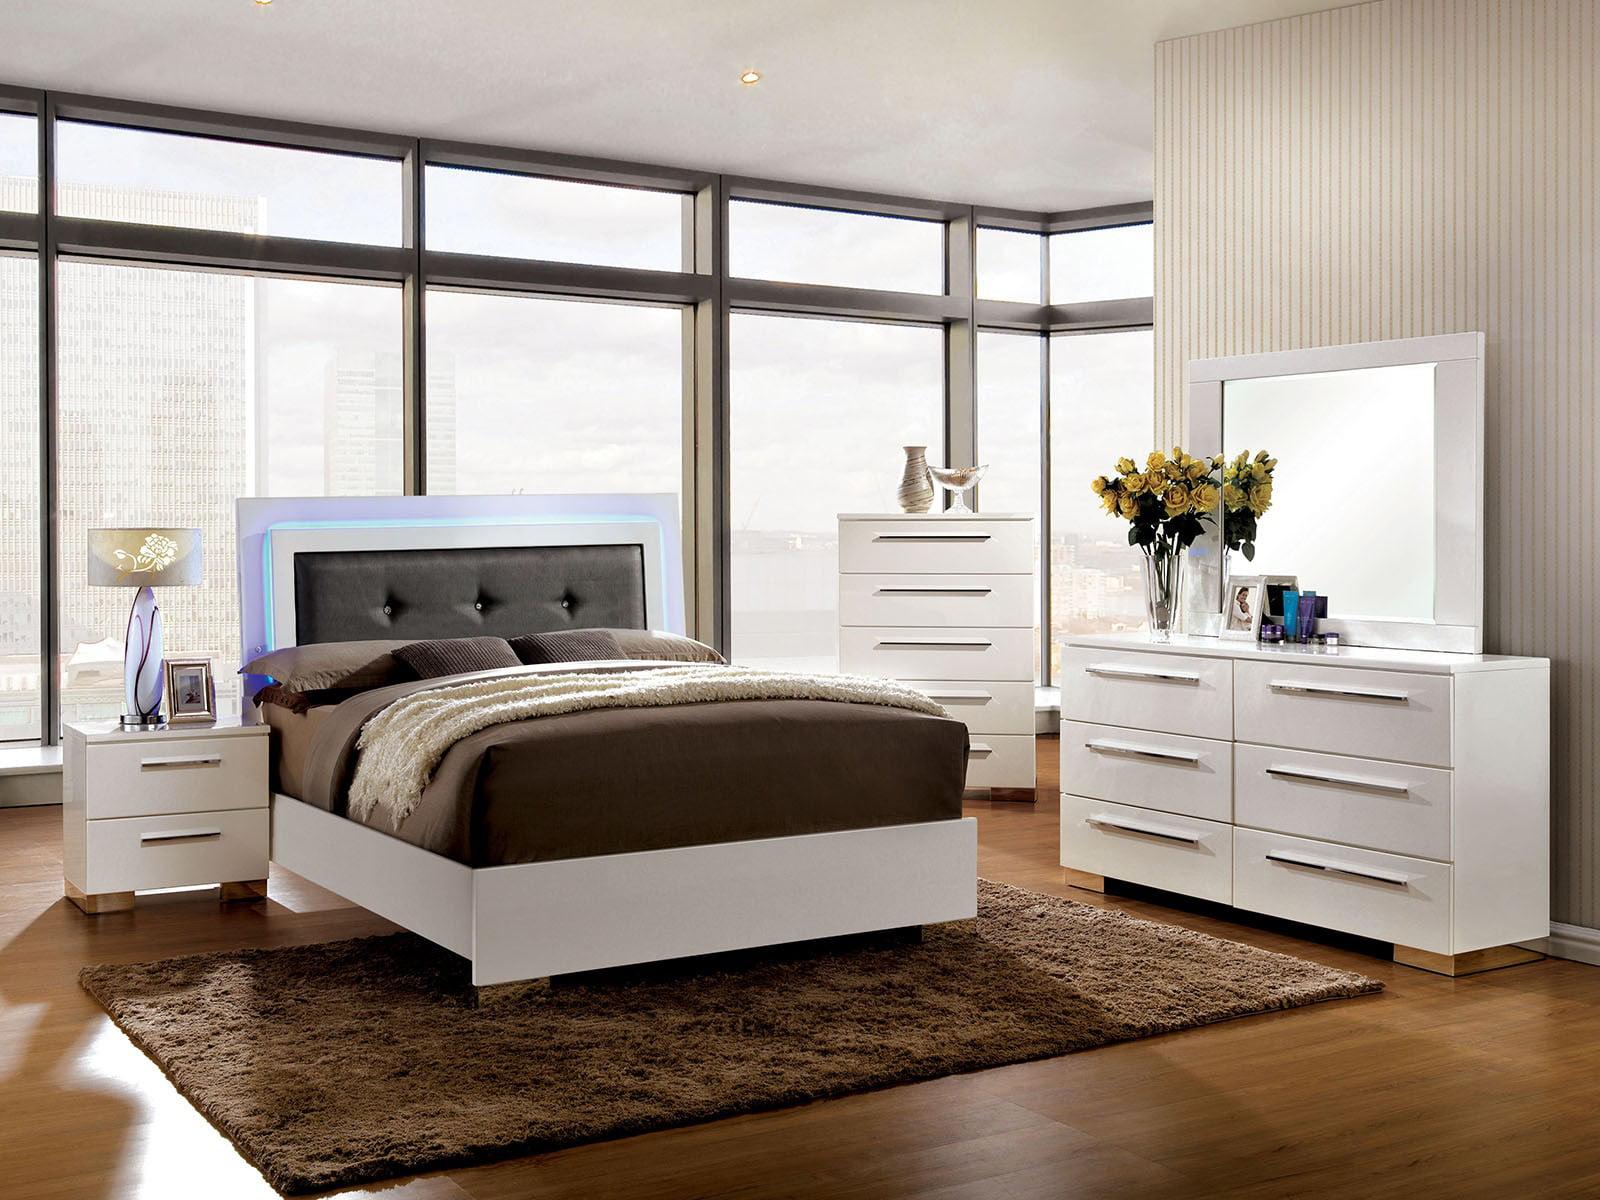 Contemporary Platform Bed W Led Lights Full Size Bed Dresser Mirror Nightstand 4pc Set Gray Leatherette White Bedroom Furniture Walmart Com Walmart Com,Modern Bathroom Wall Art Ideas